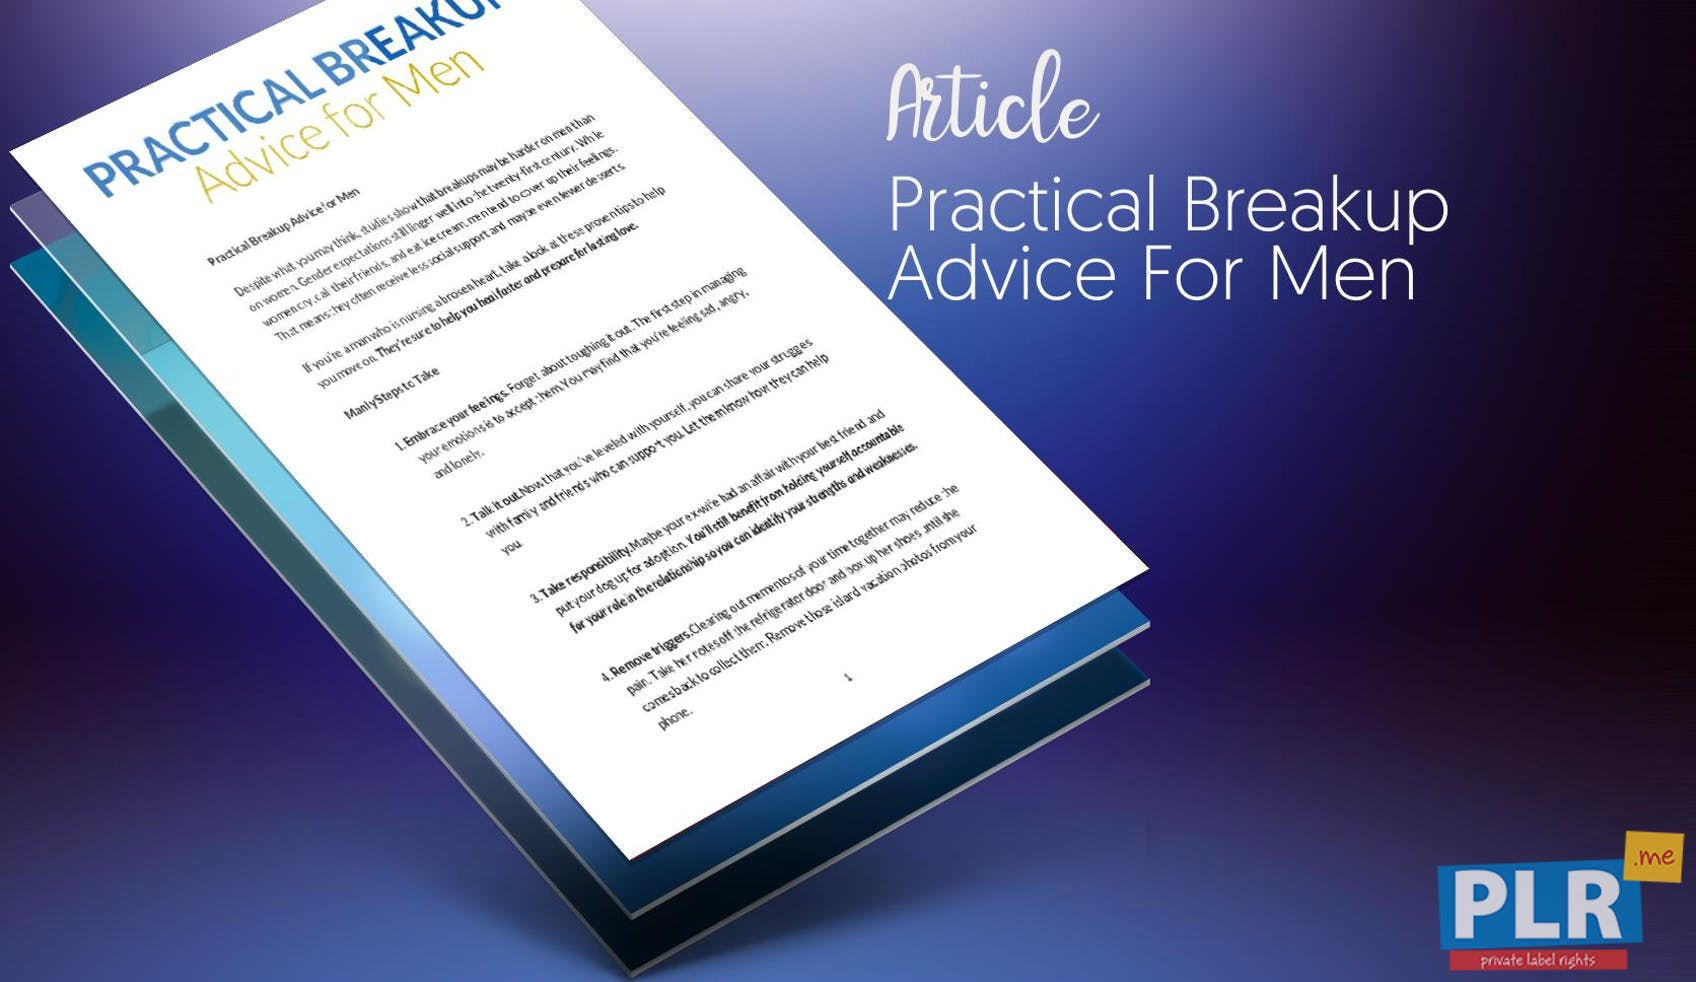 Practical Breakup Advice For Men